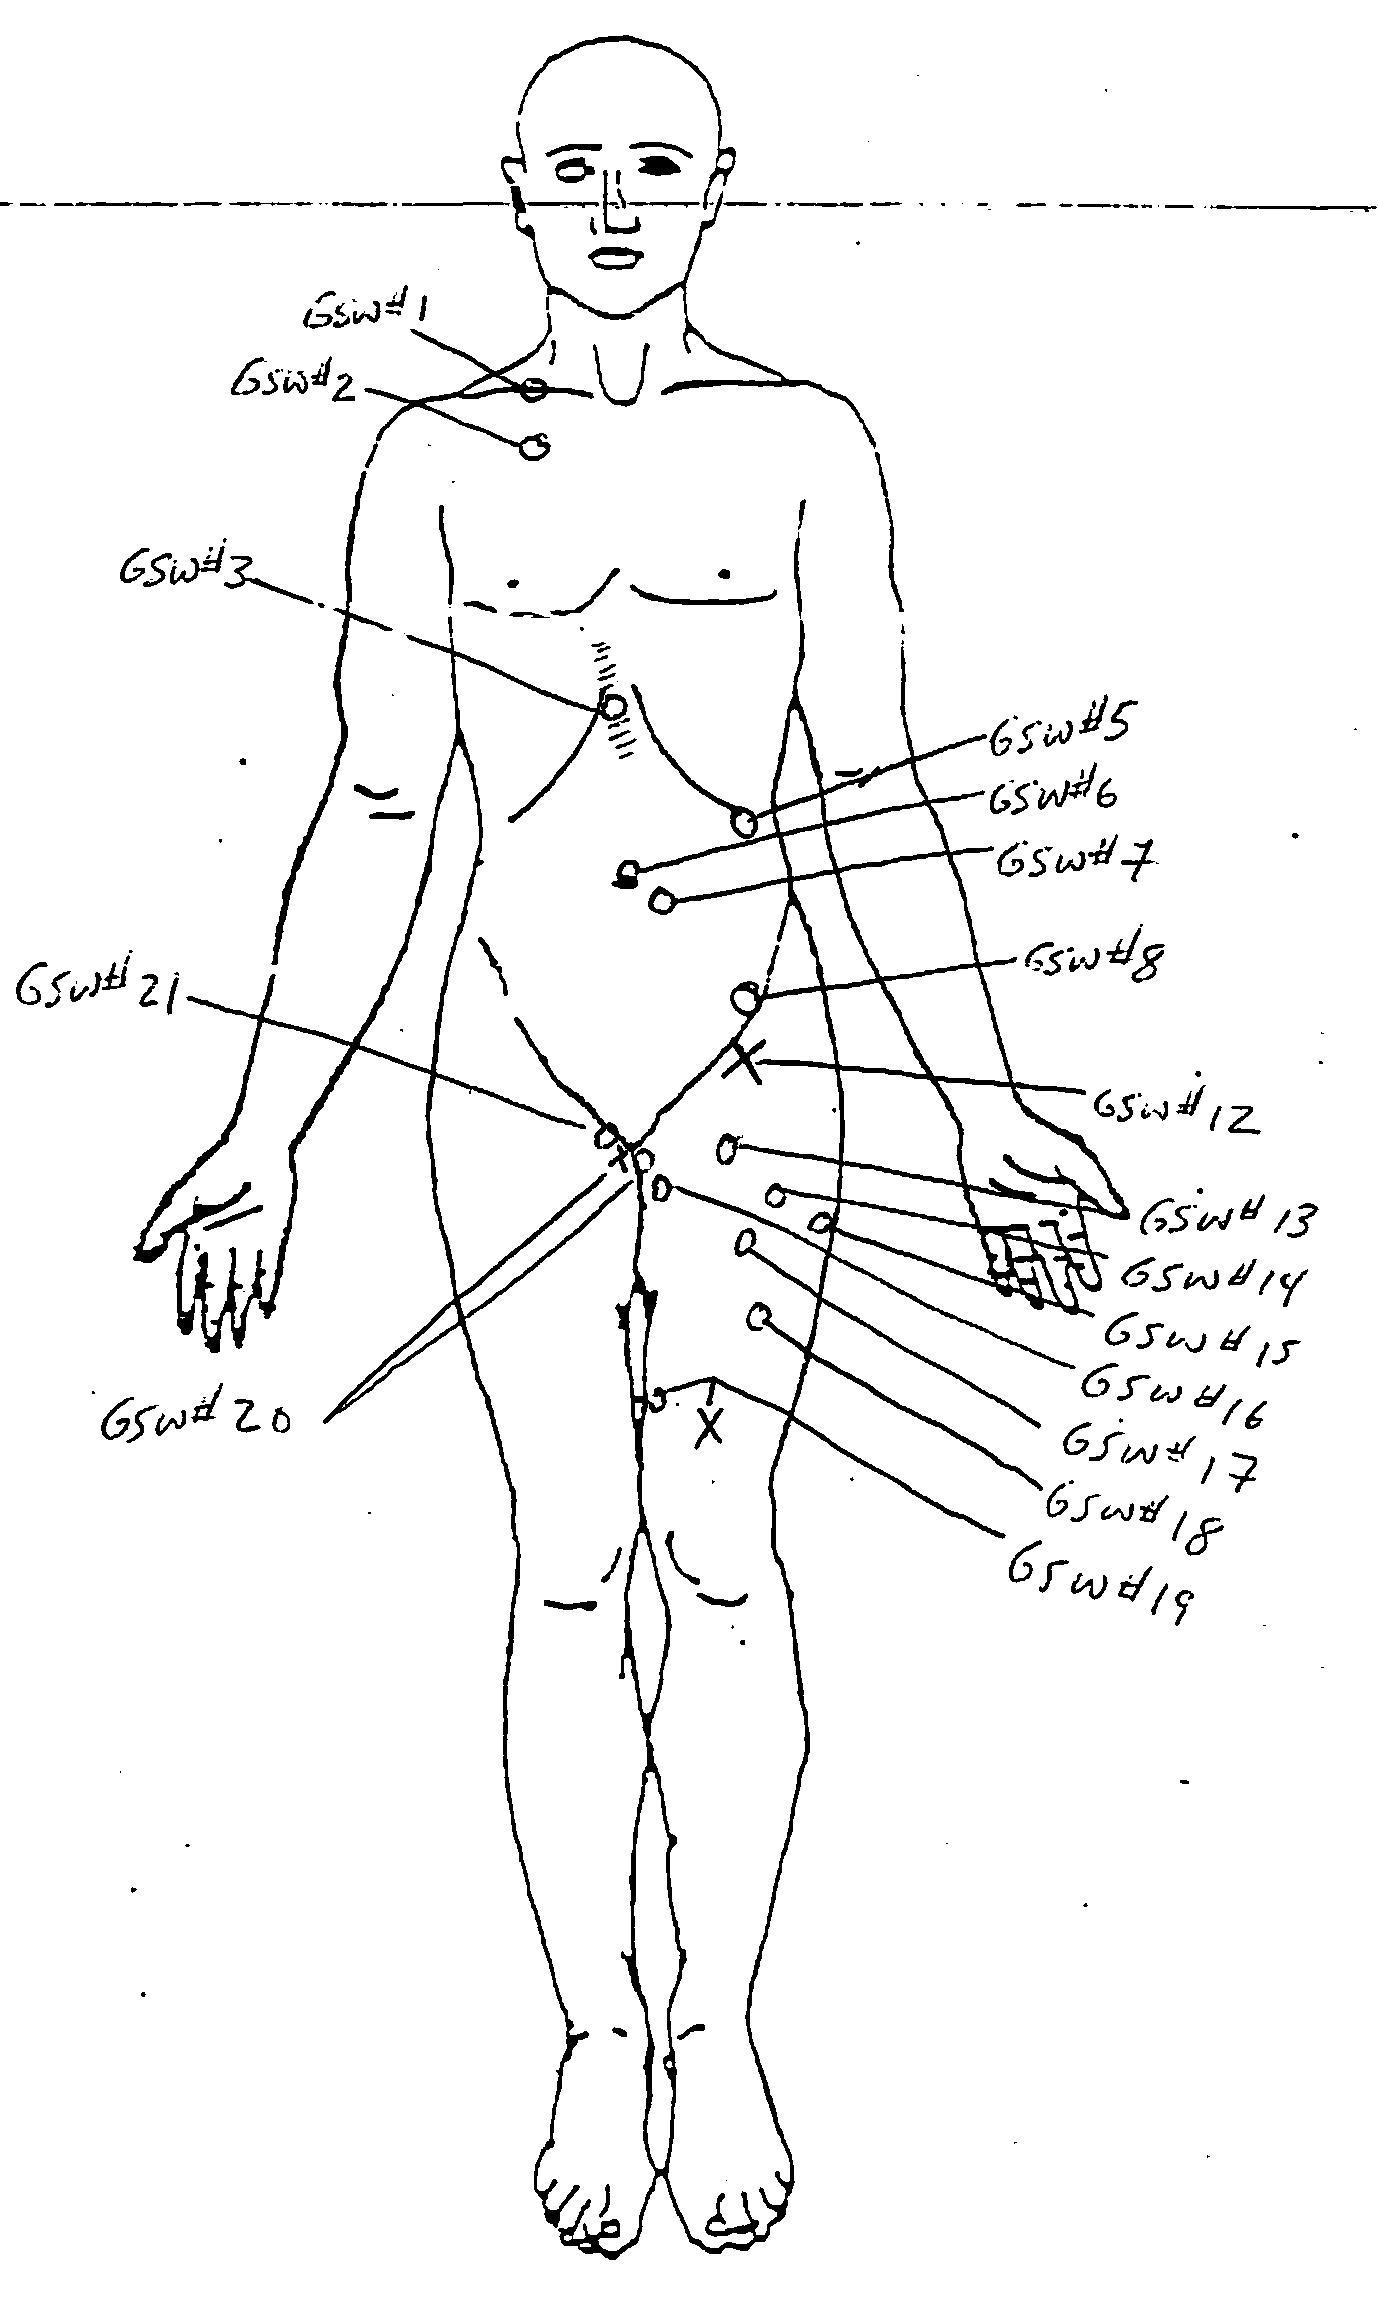 2010-03-13-Autopsy_p11.jpg